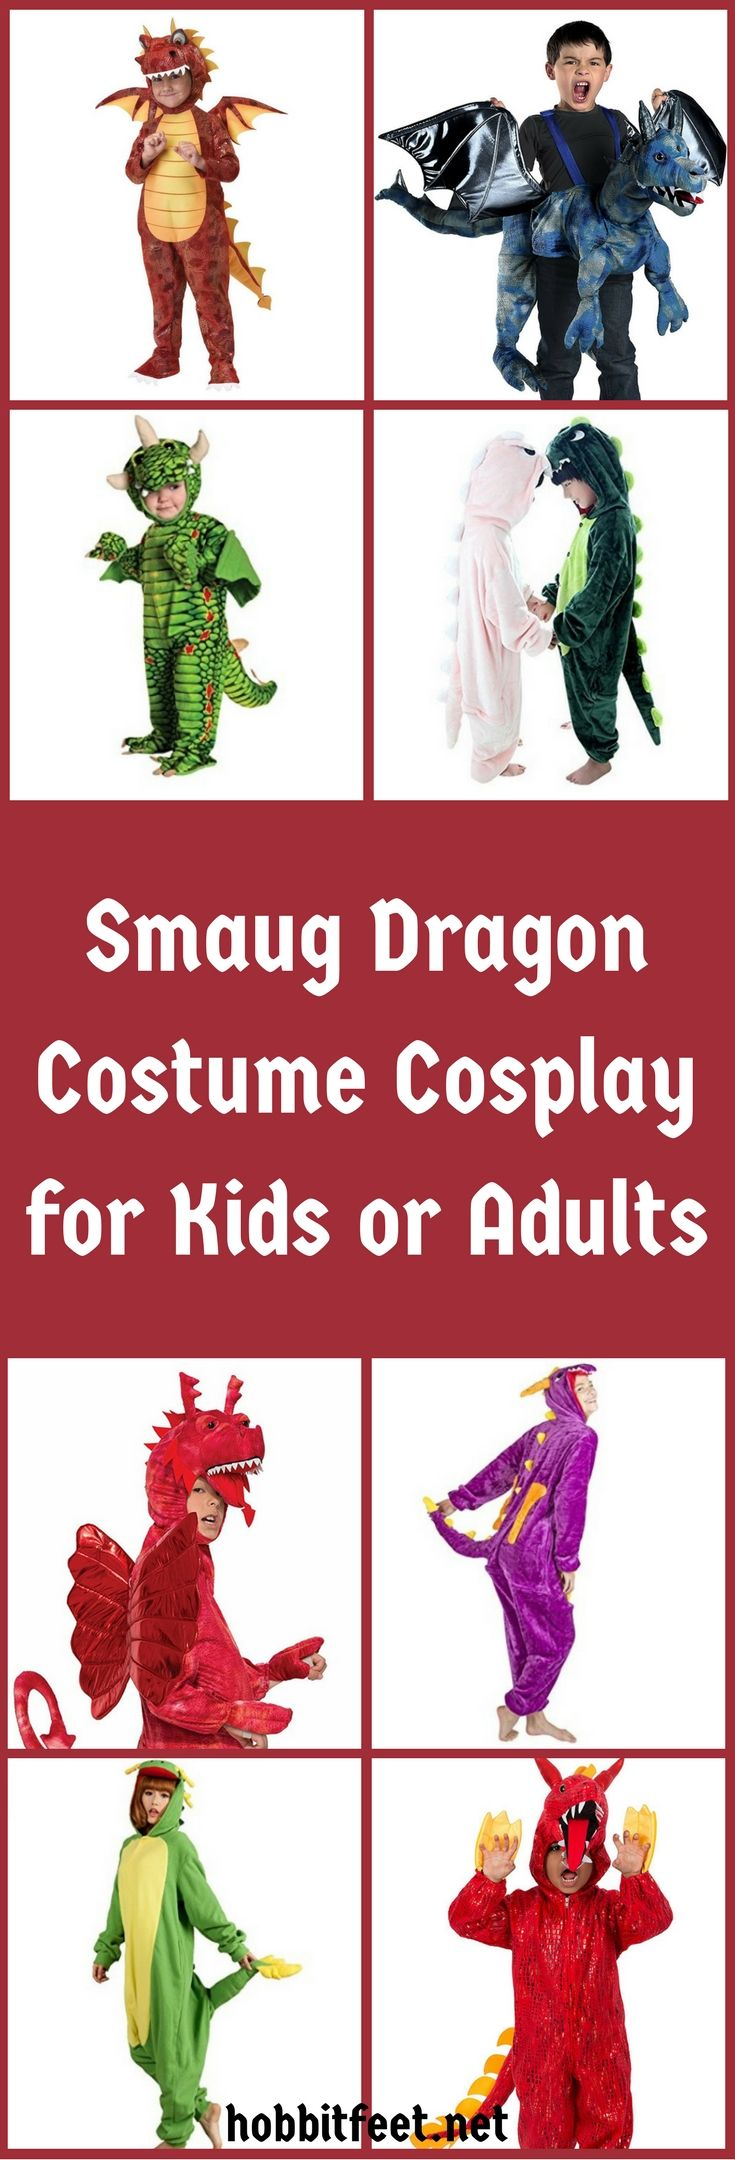 Smaug Dragon Costume Cosplay for Kids or Adults